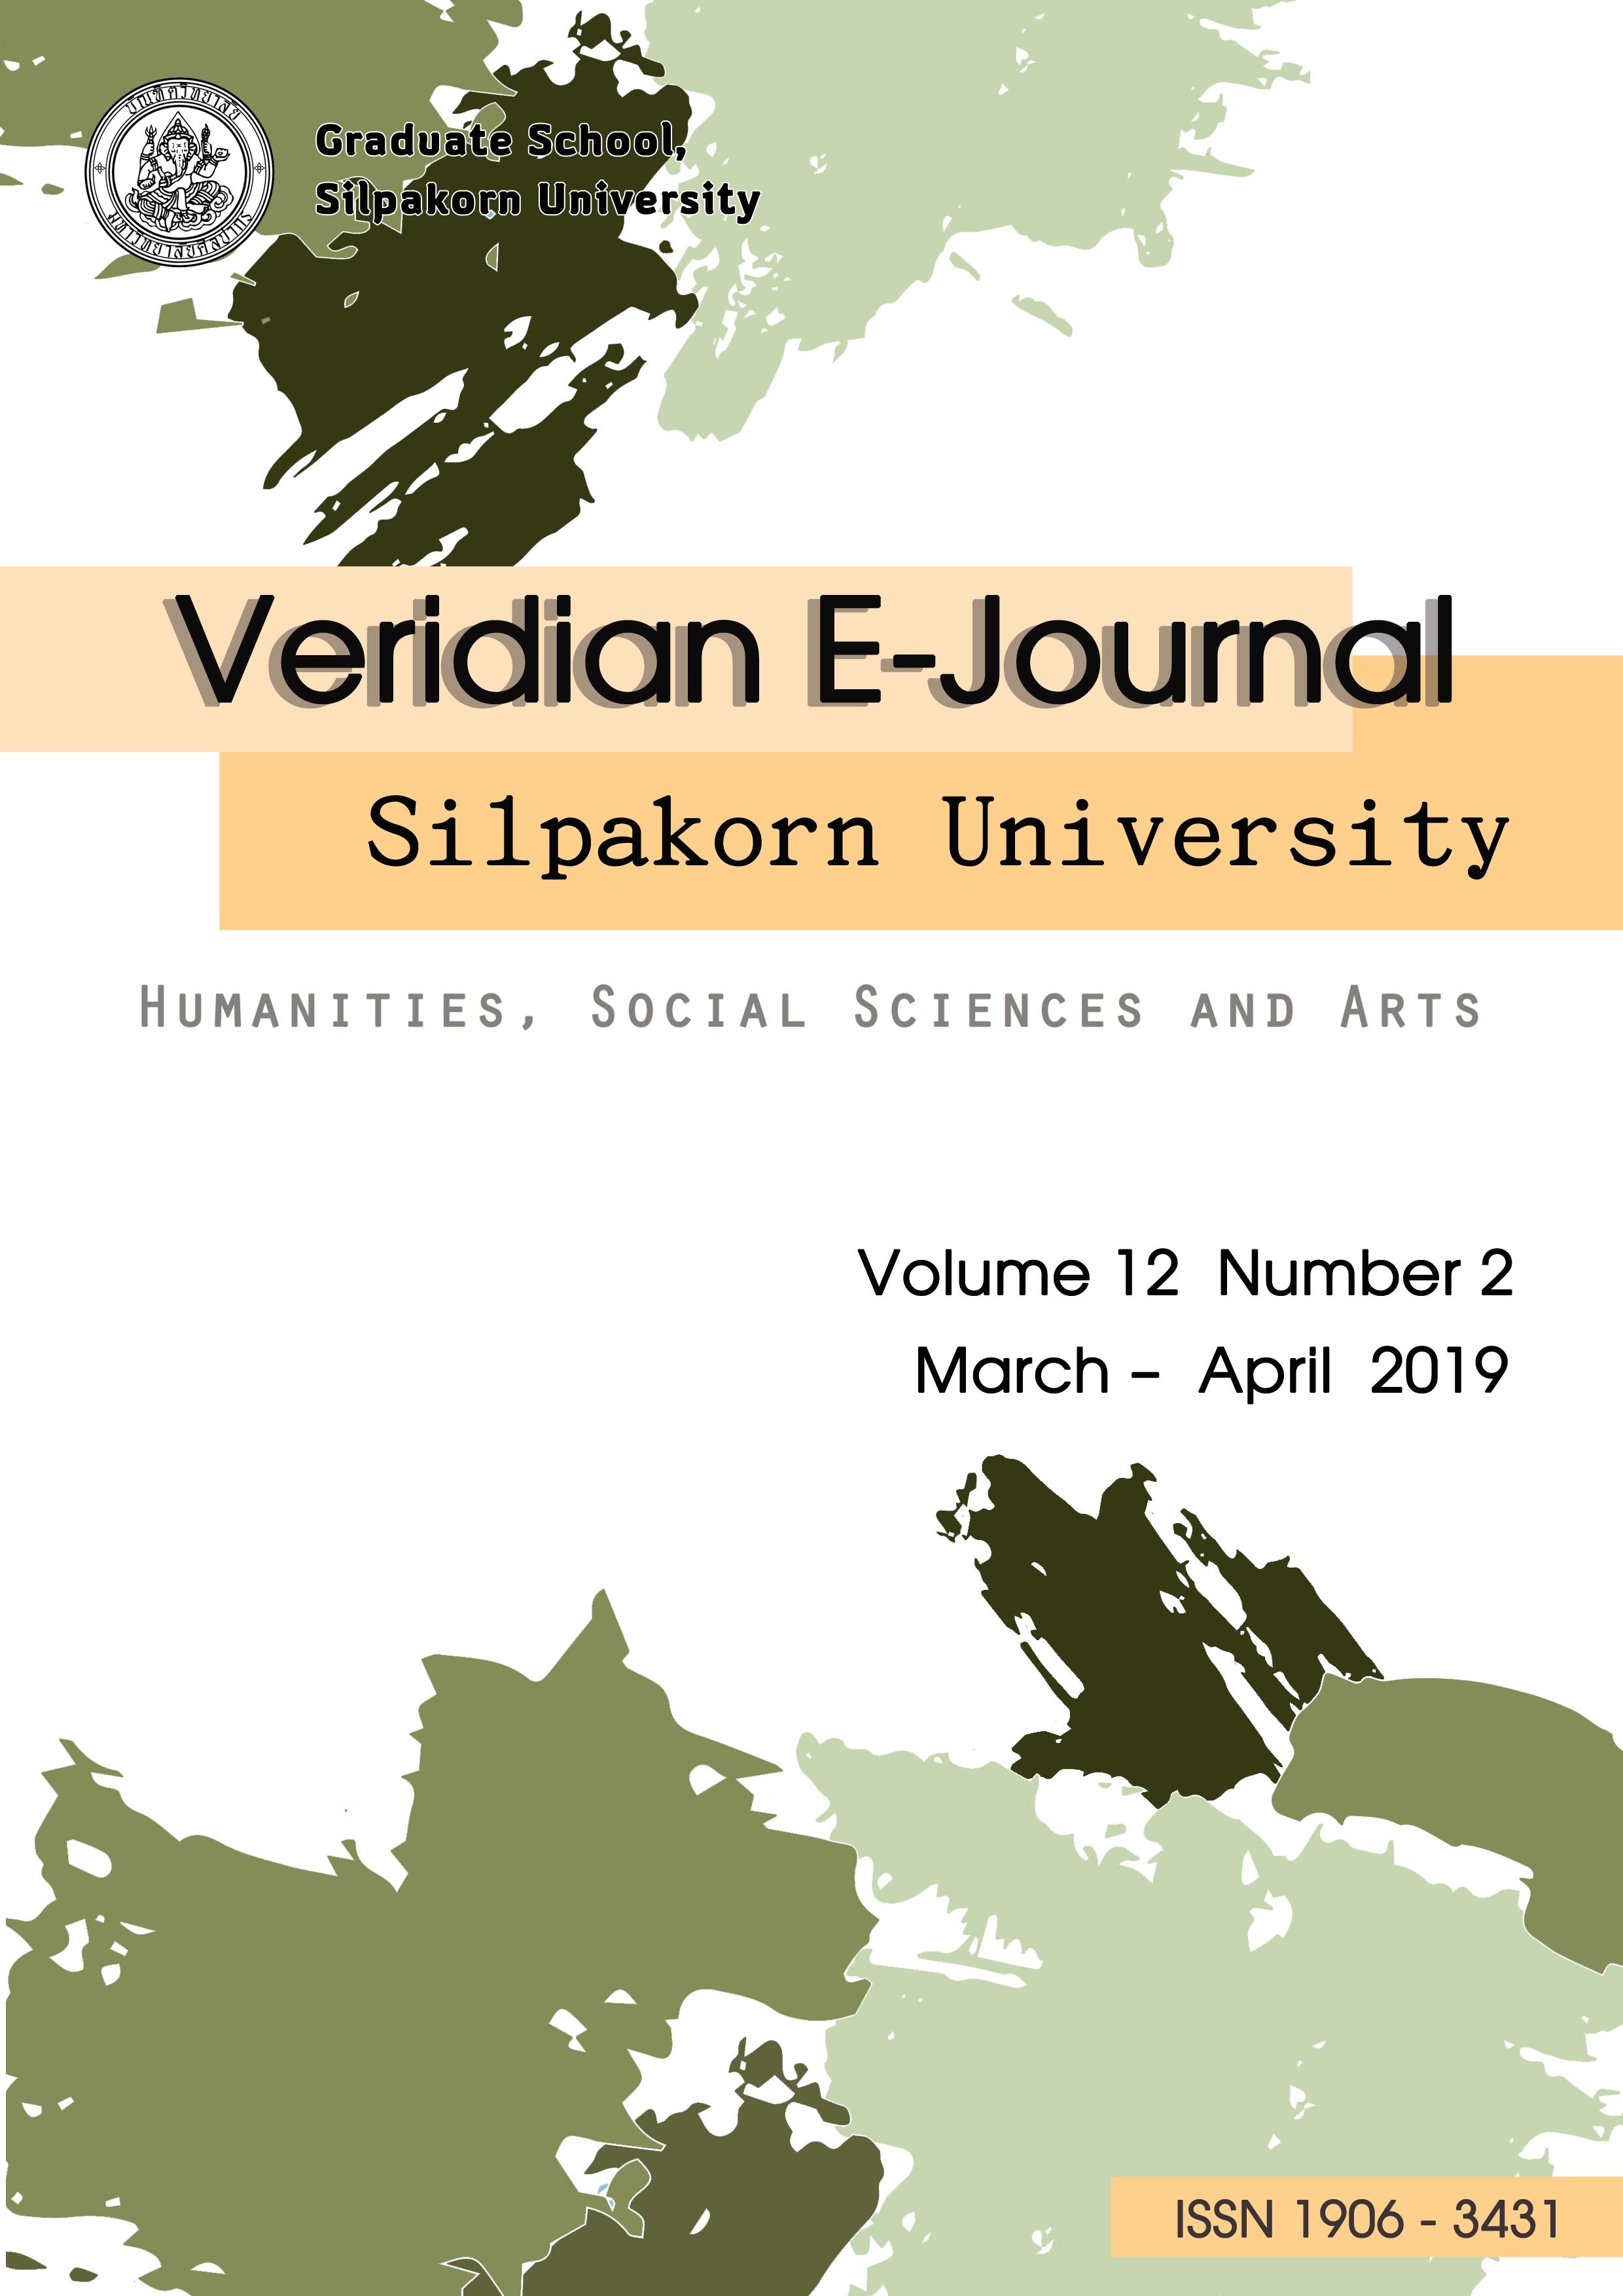 Ucla dissertation year fellowship deadline